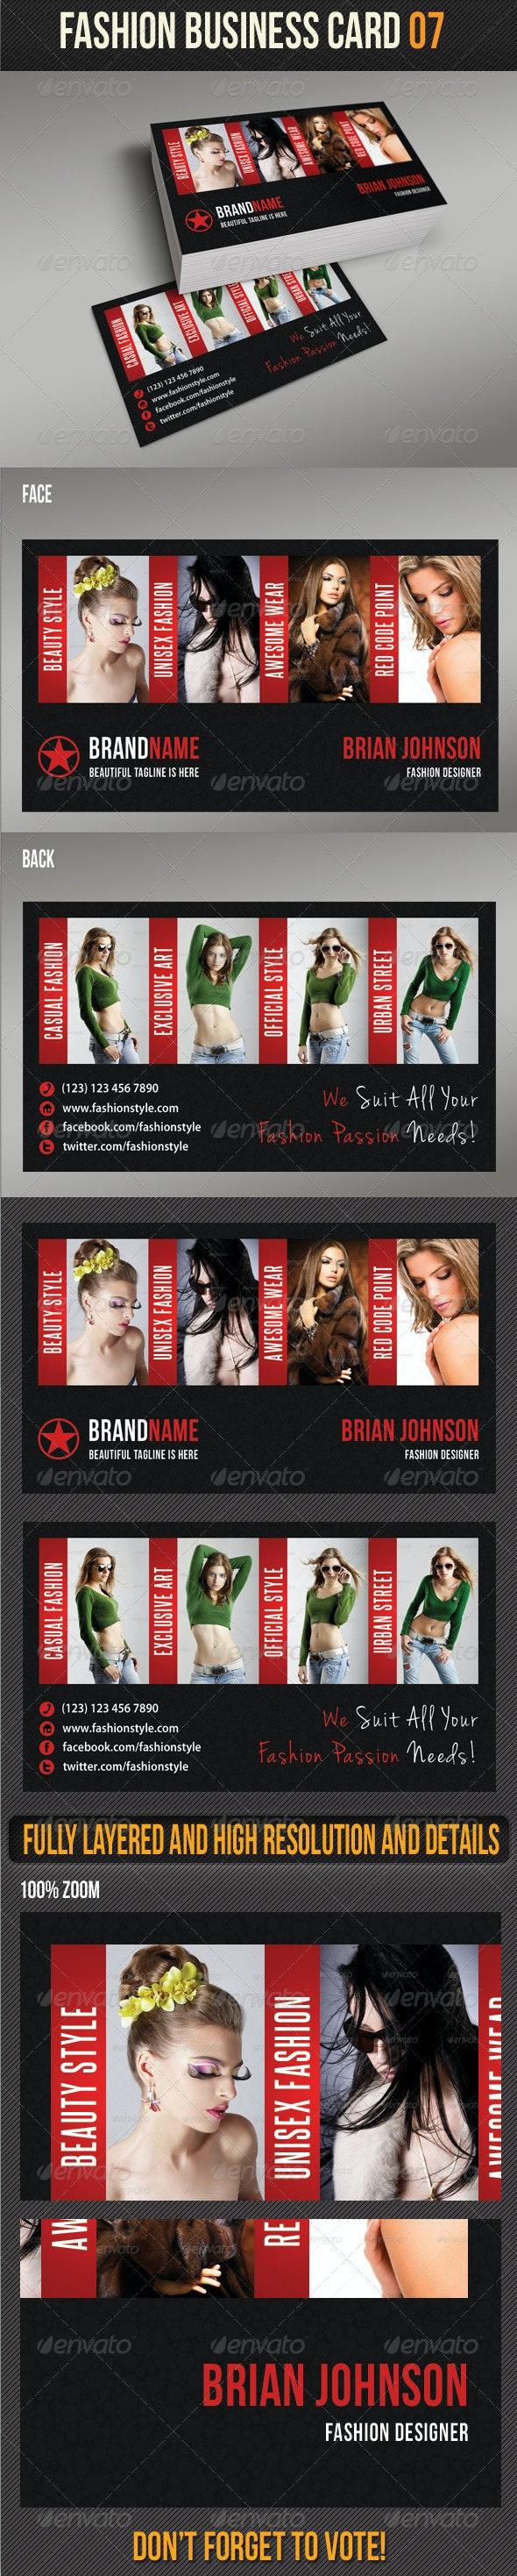 Fashion Business Card 07 - Creative Business Cards